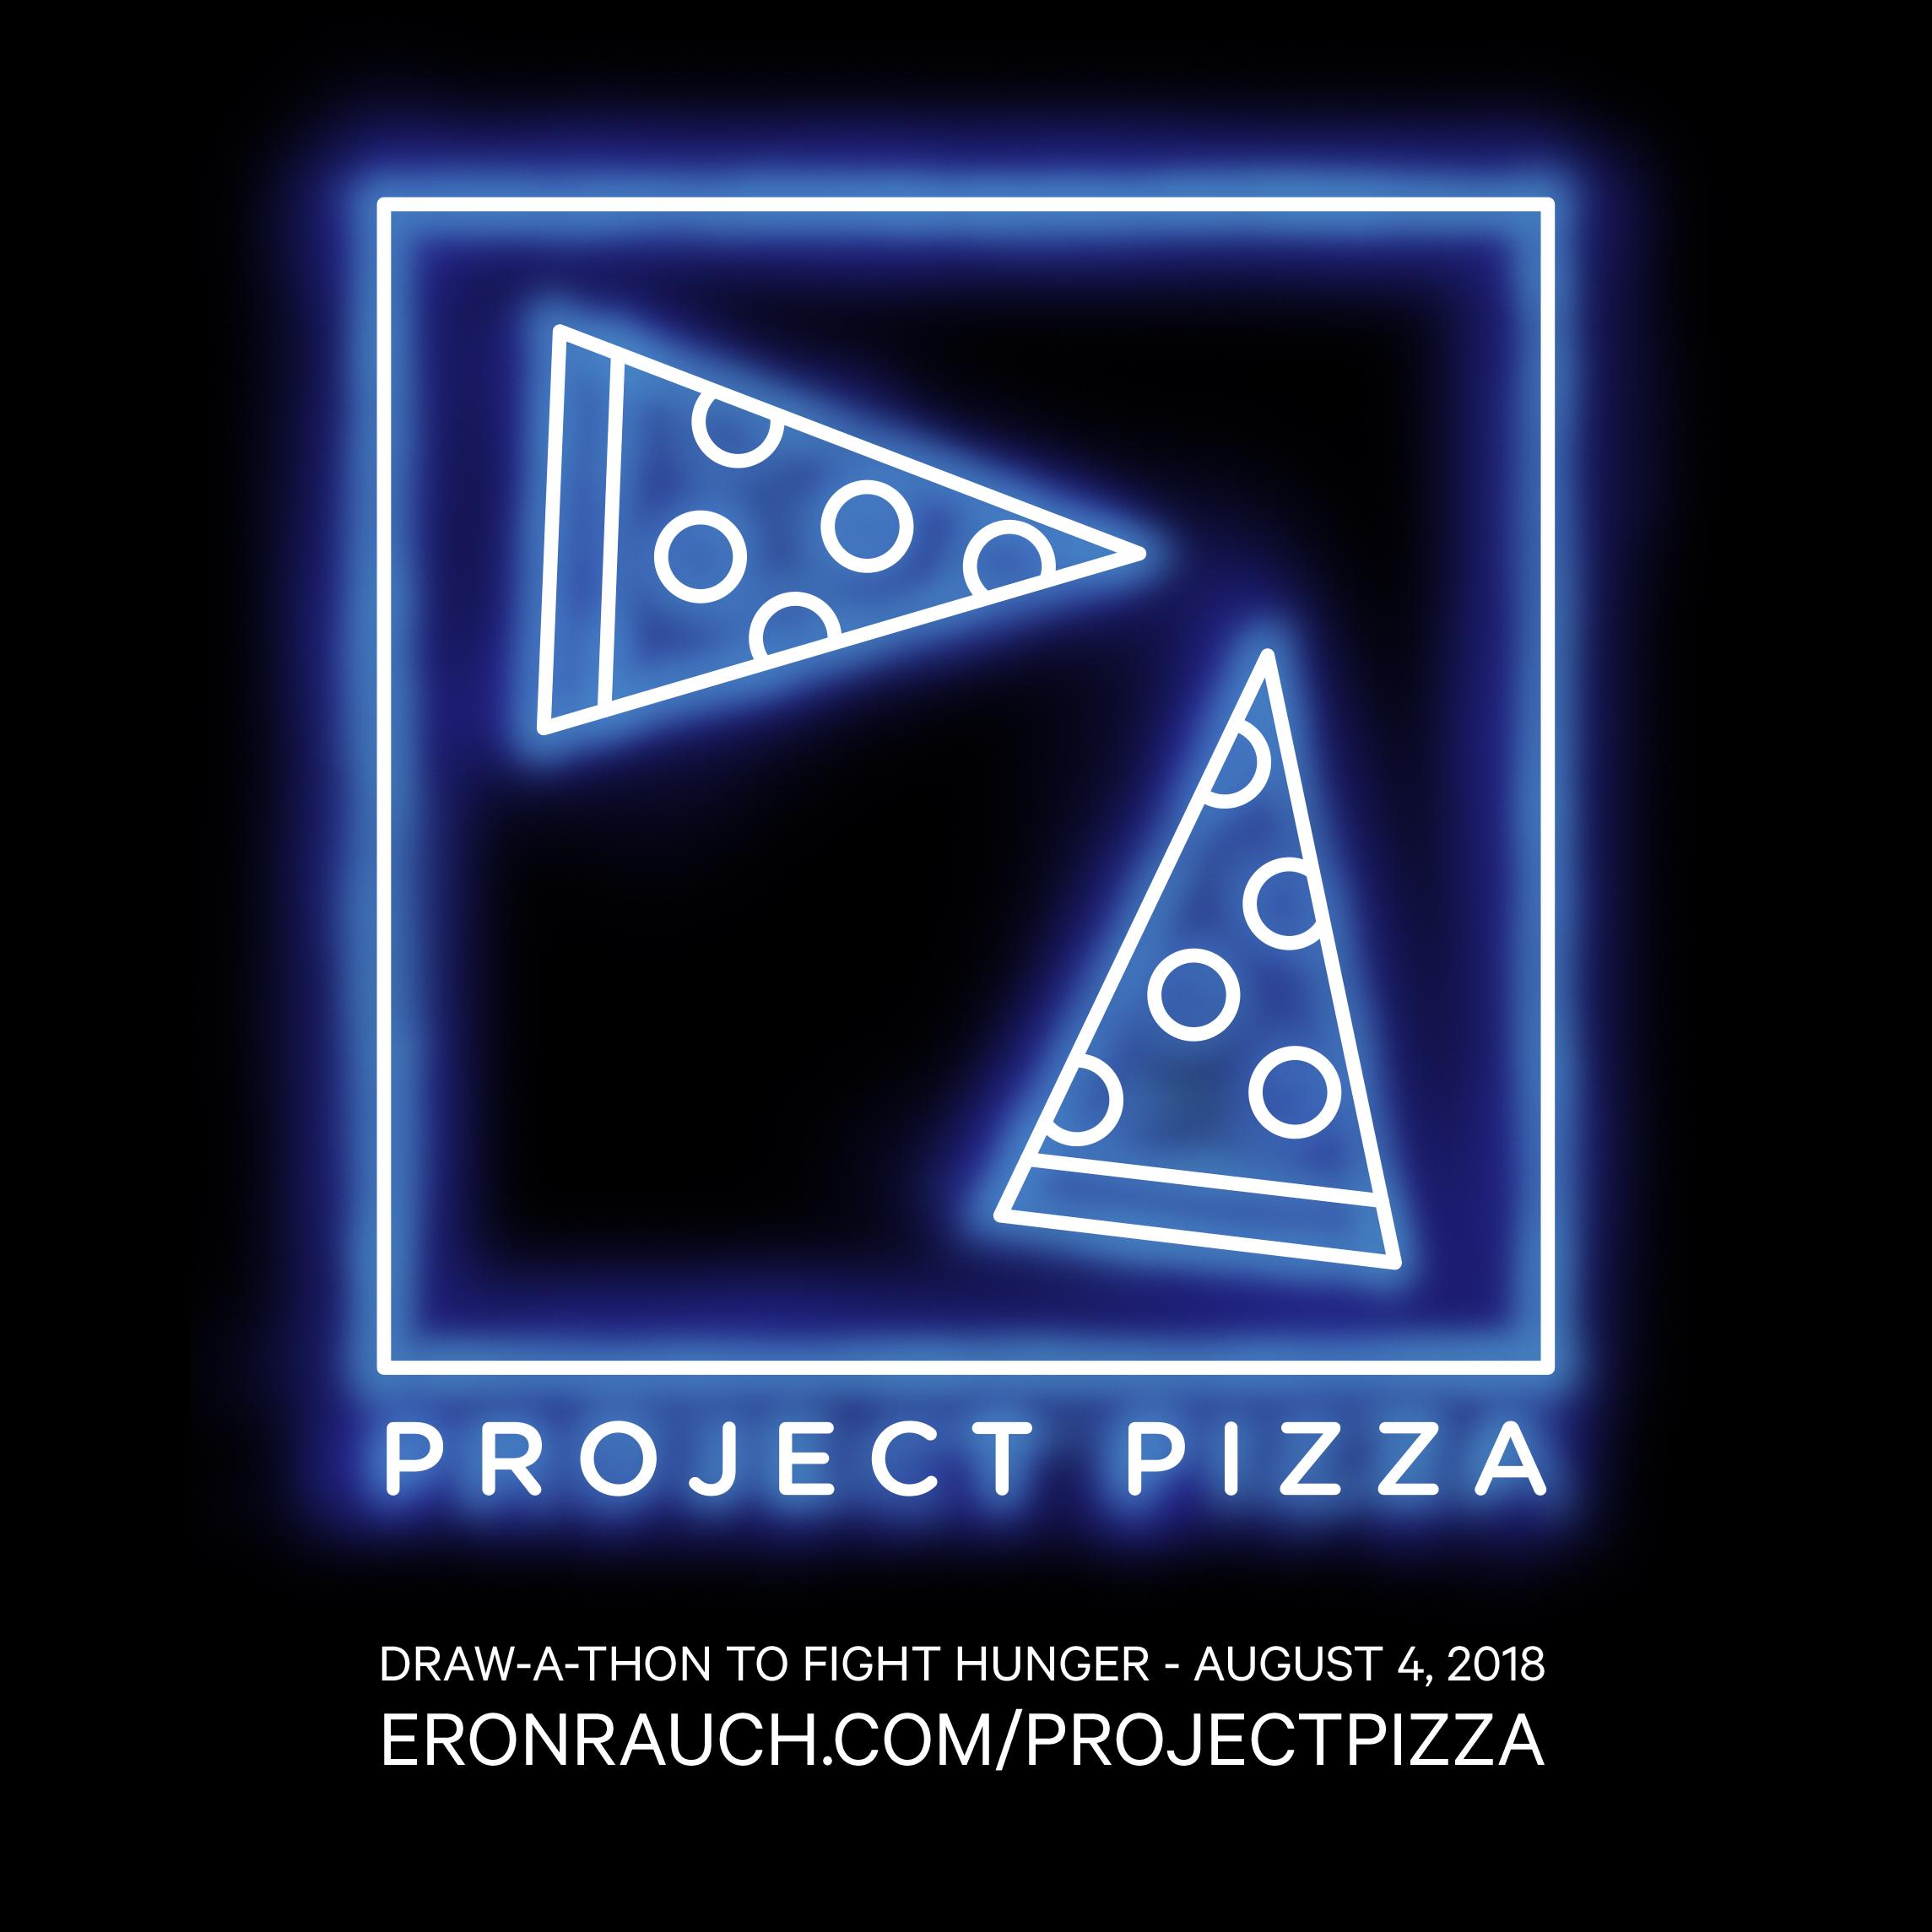 Project-Pizza-Logo-Bumper-2018.jpg